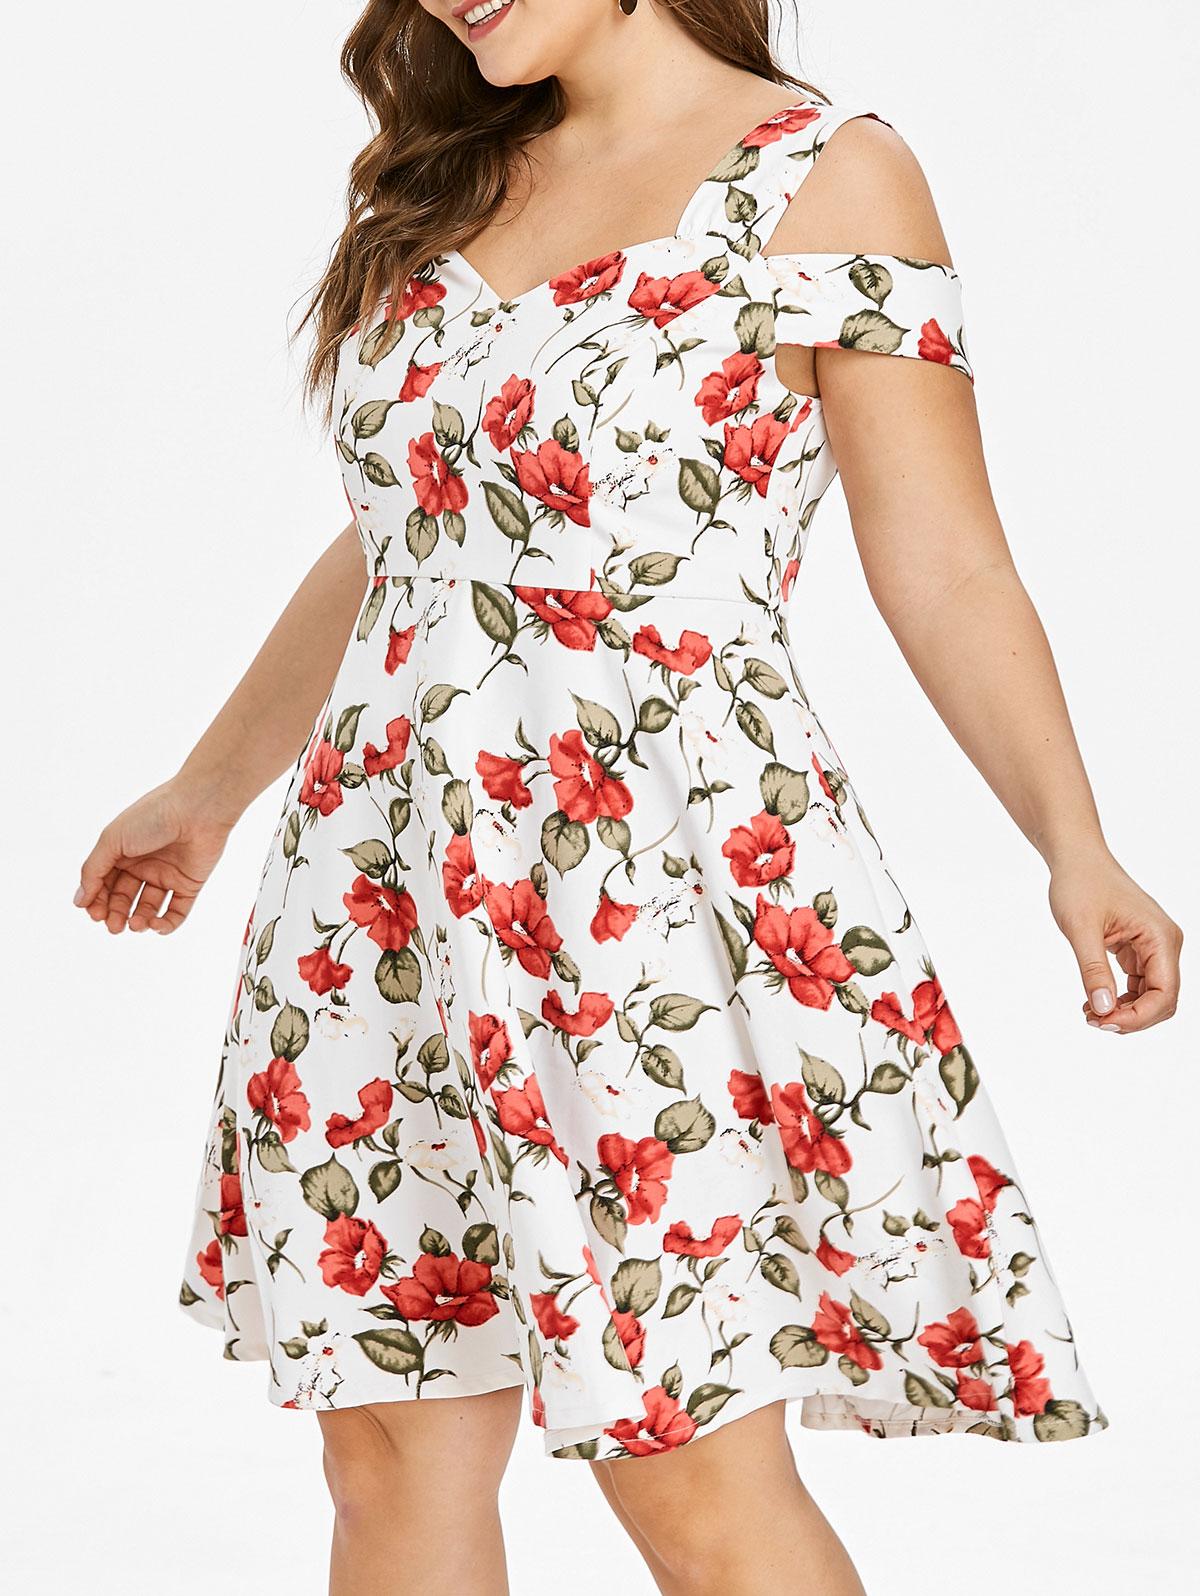 Retro Plus Size Floral Print Summer Dress Women Casual